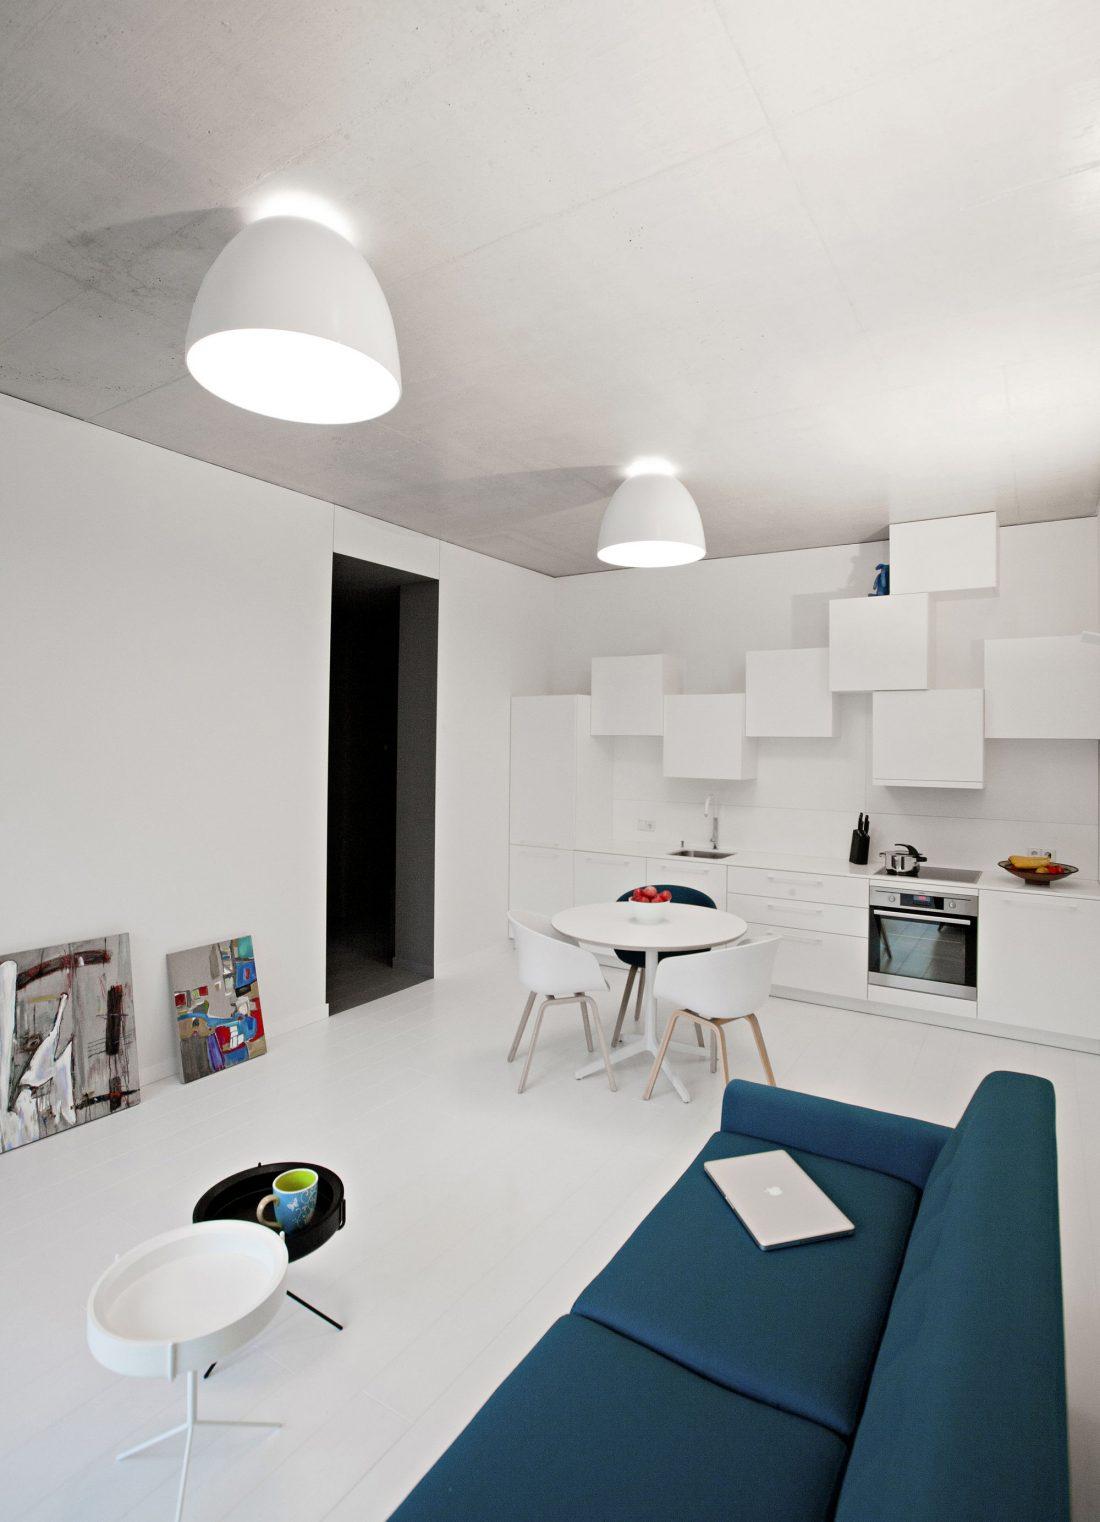 Квартира в Вильнюсе по проекту студии YCL 8